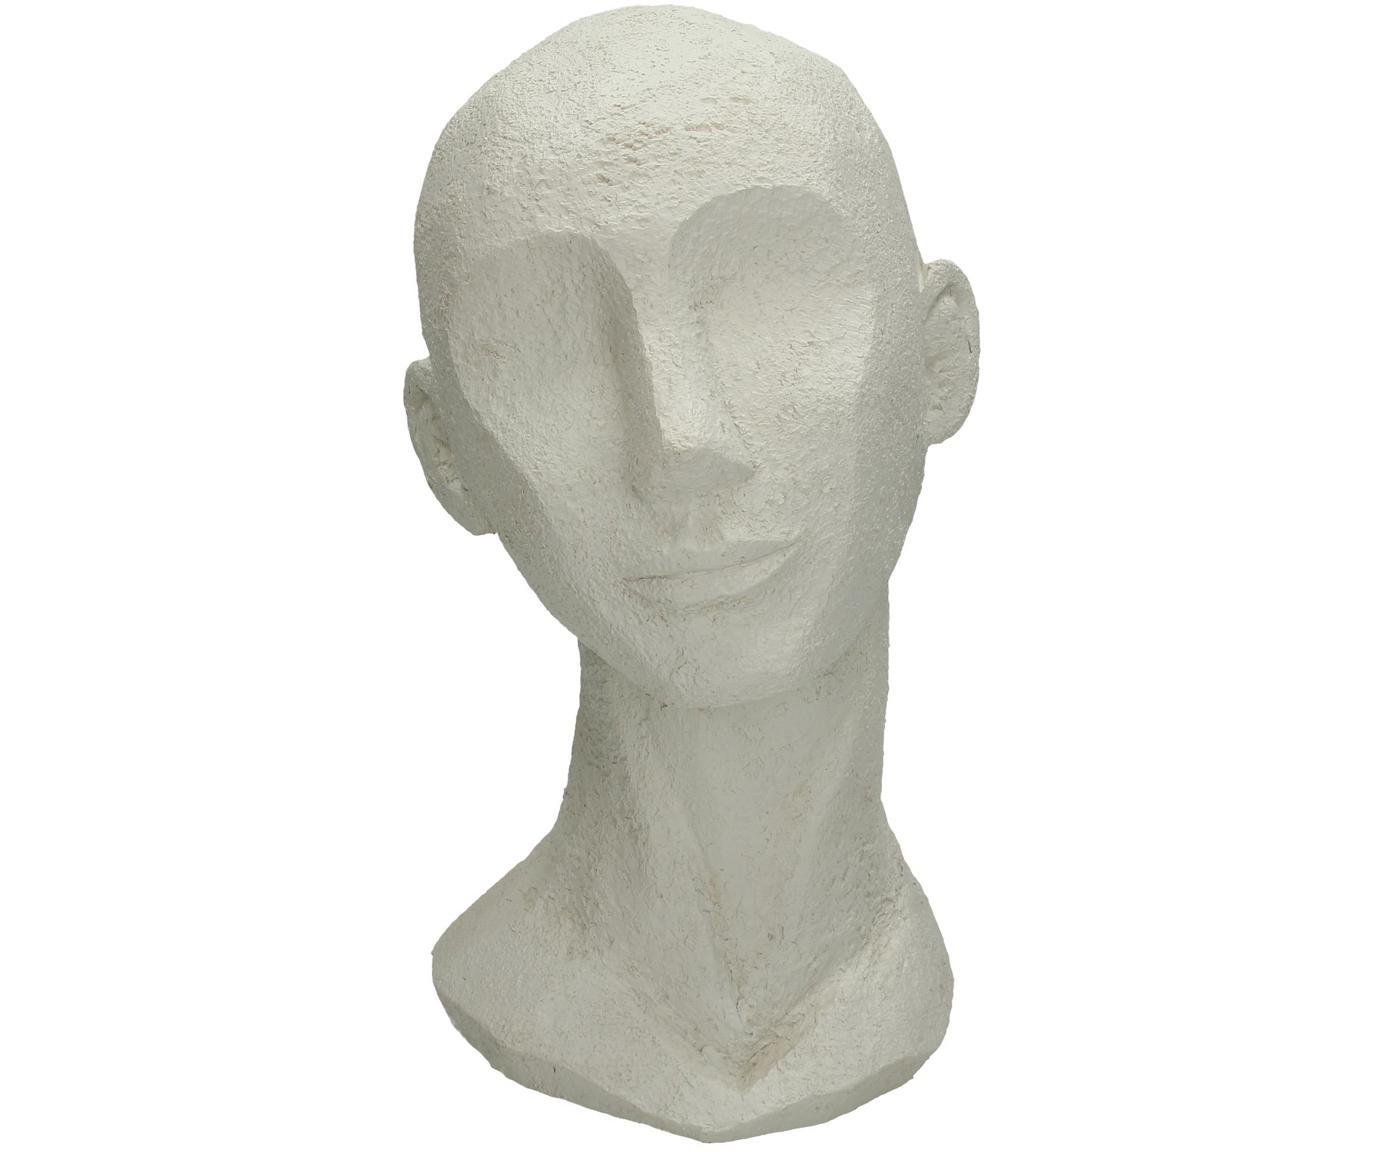 Figura decorativa Head, Poliresina, Blanco crema, An 18 x Al 28 cm